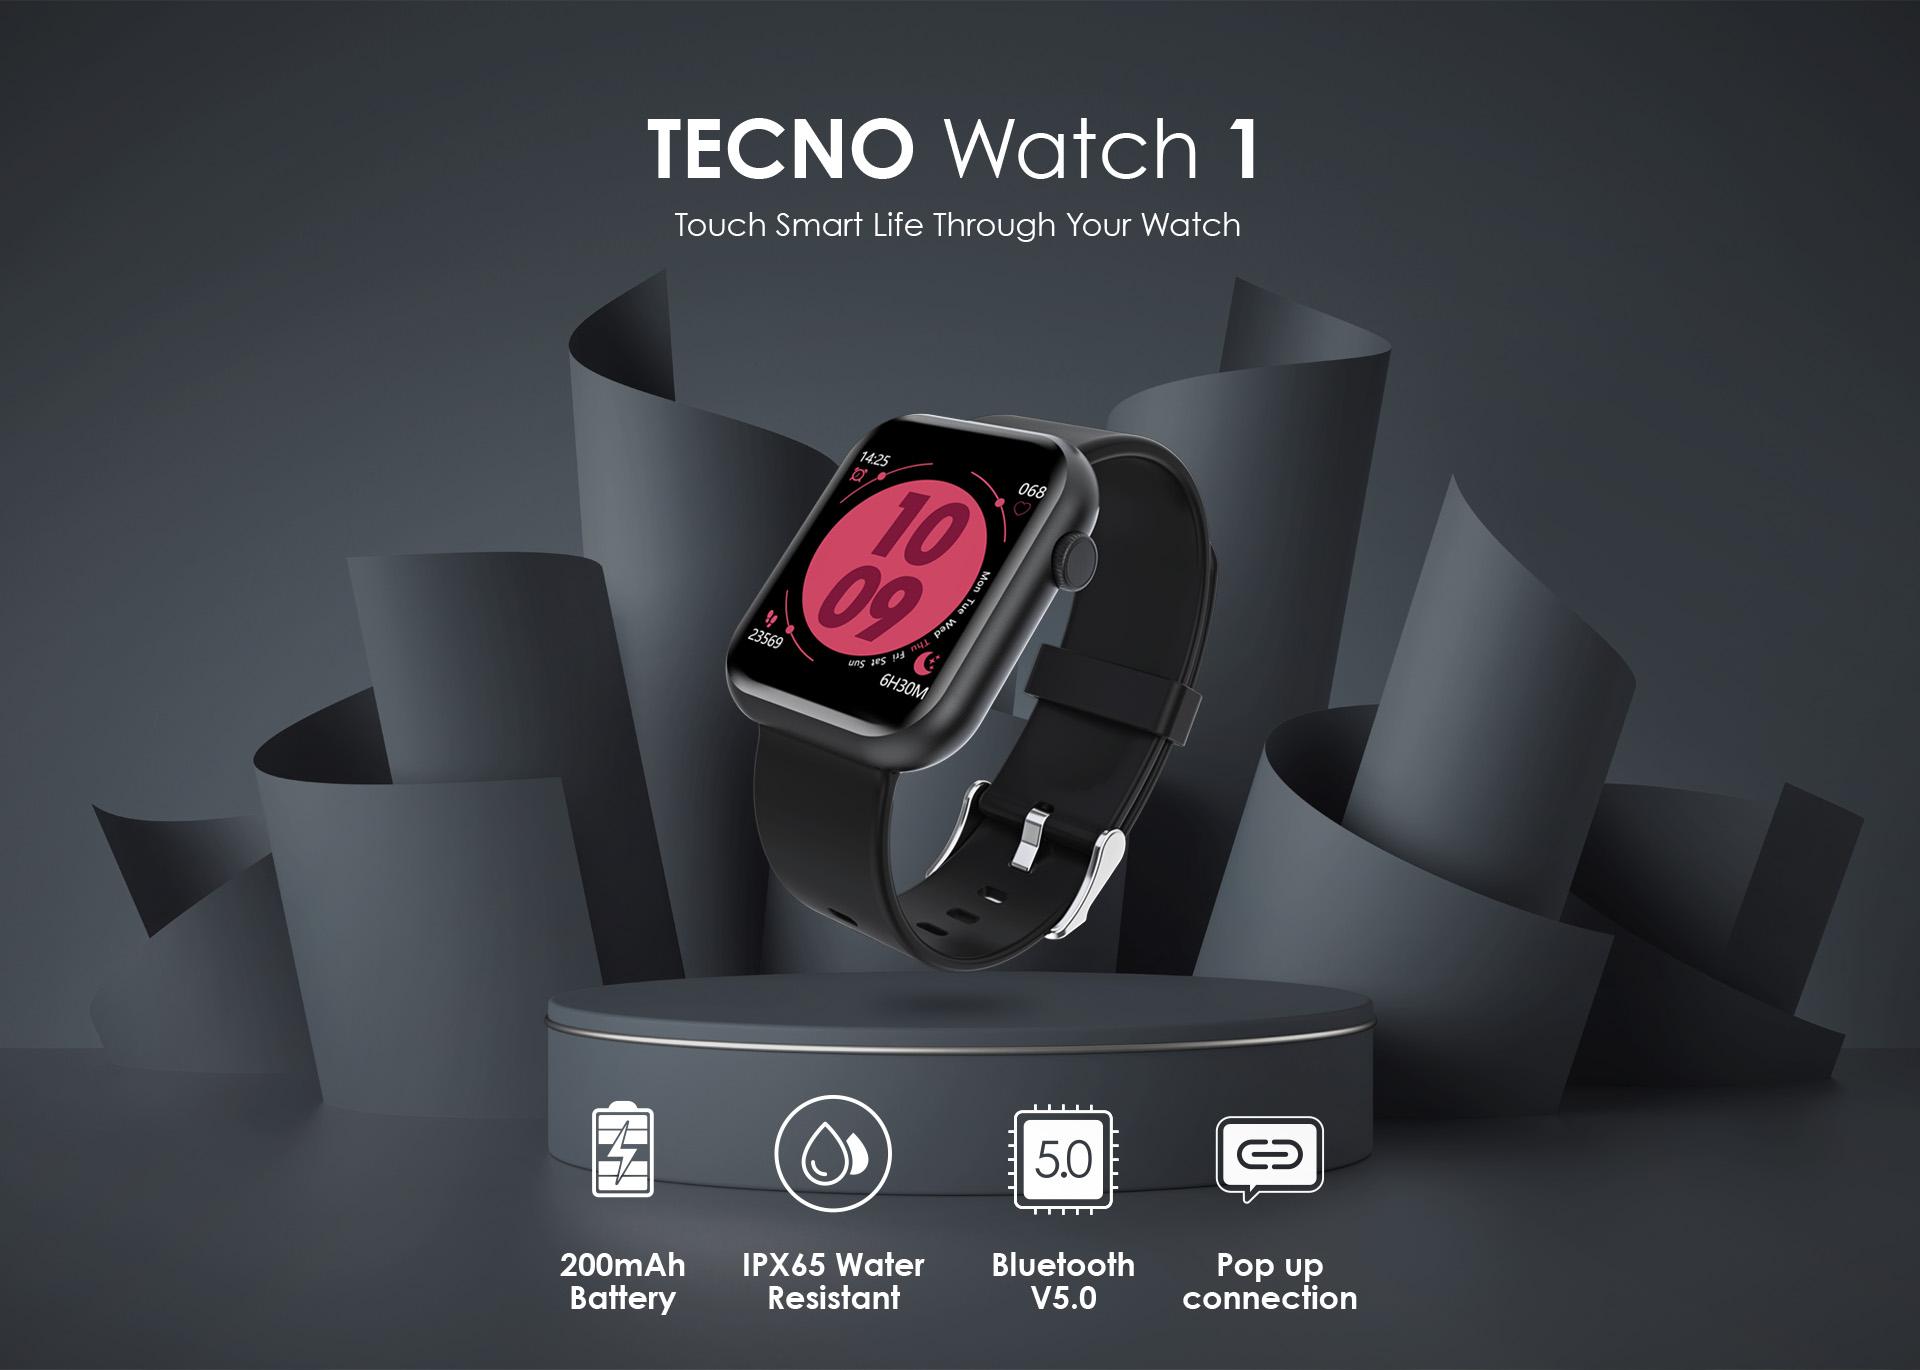 watch1-pc-01.jpg